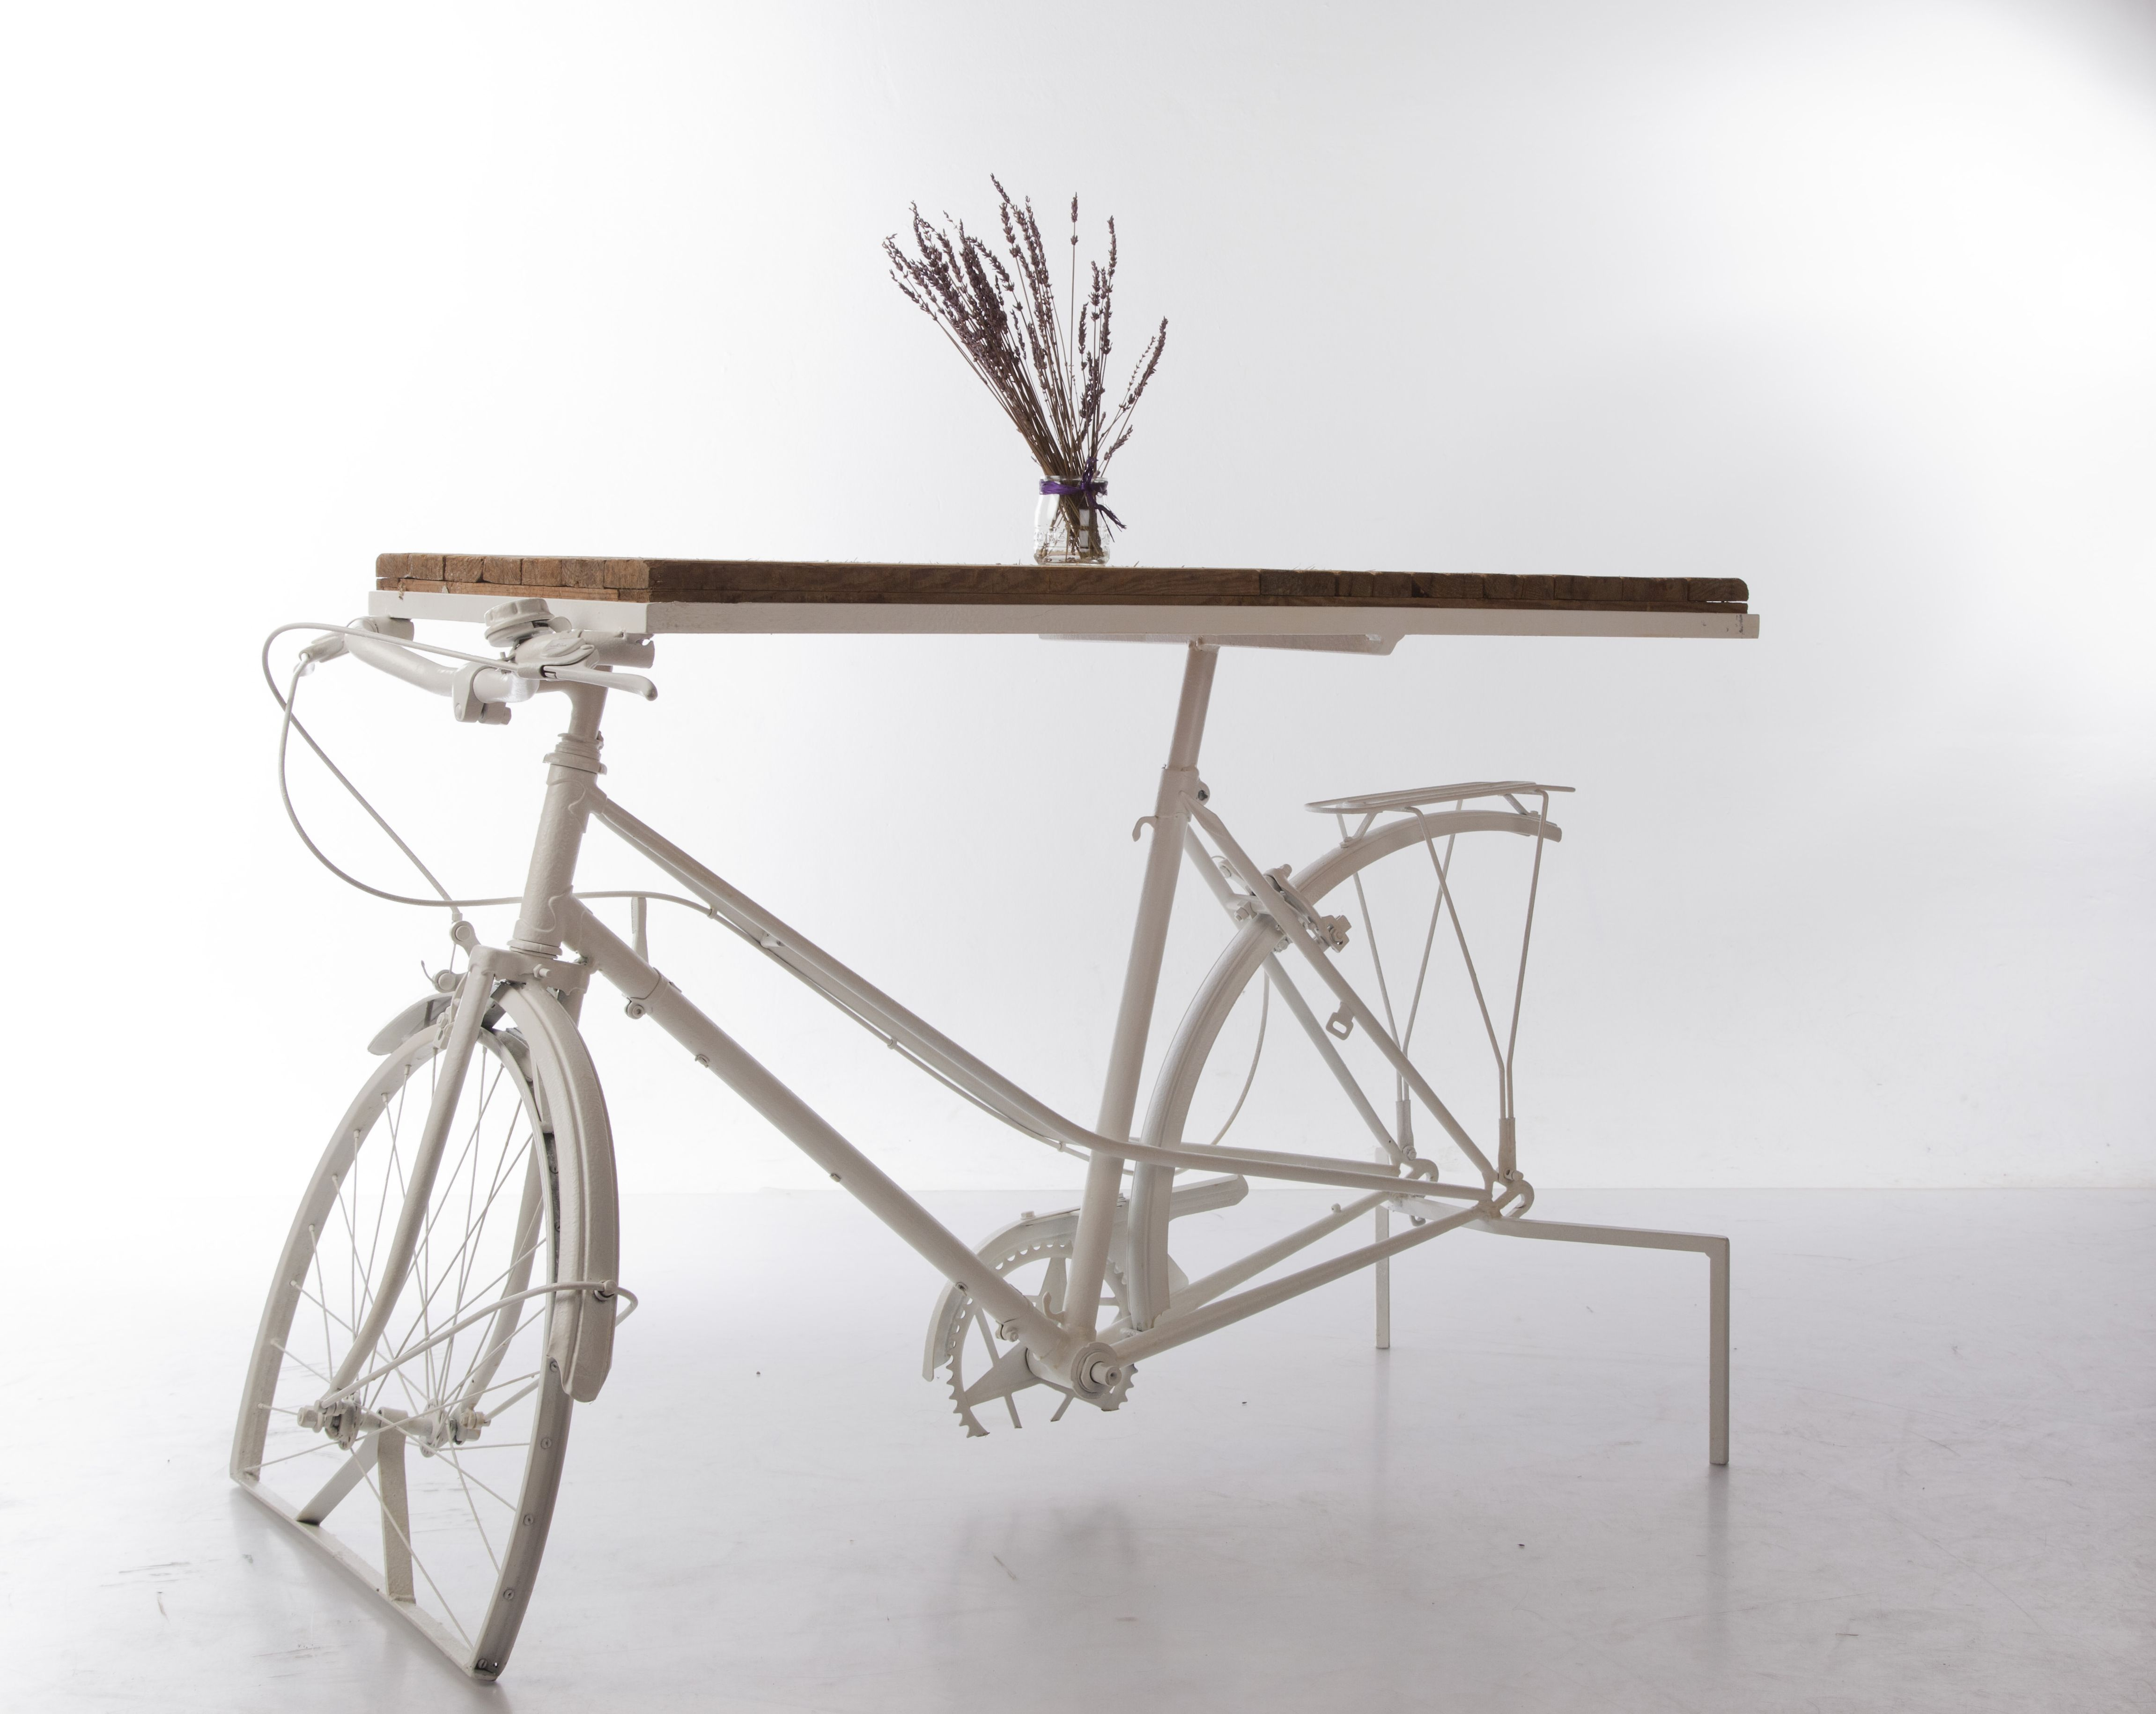 Mesa Con Estructura De Bicicleta I Tarima De Feria Info180graus  # Muebles Bicicleta